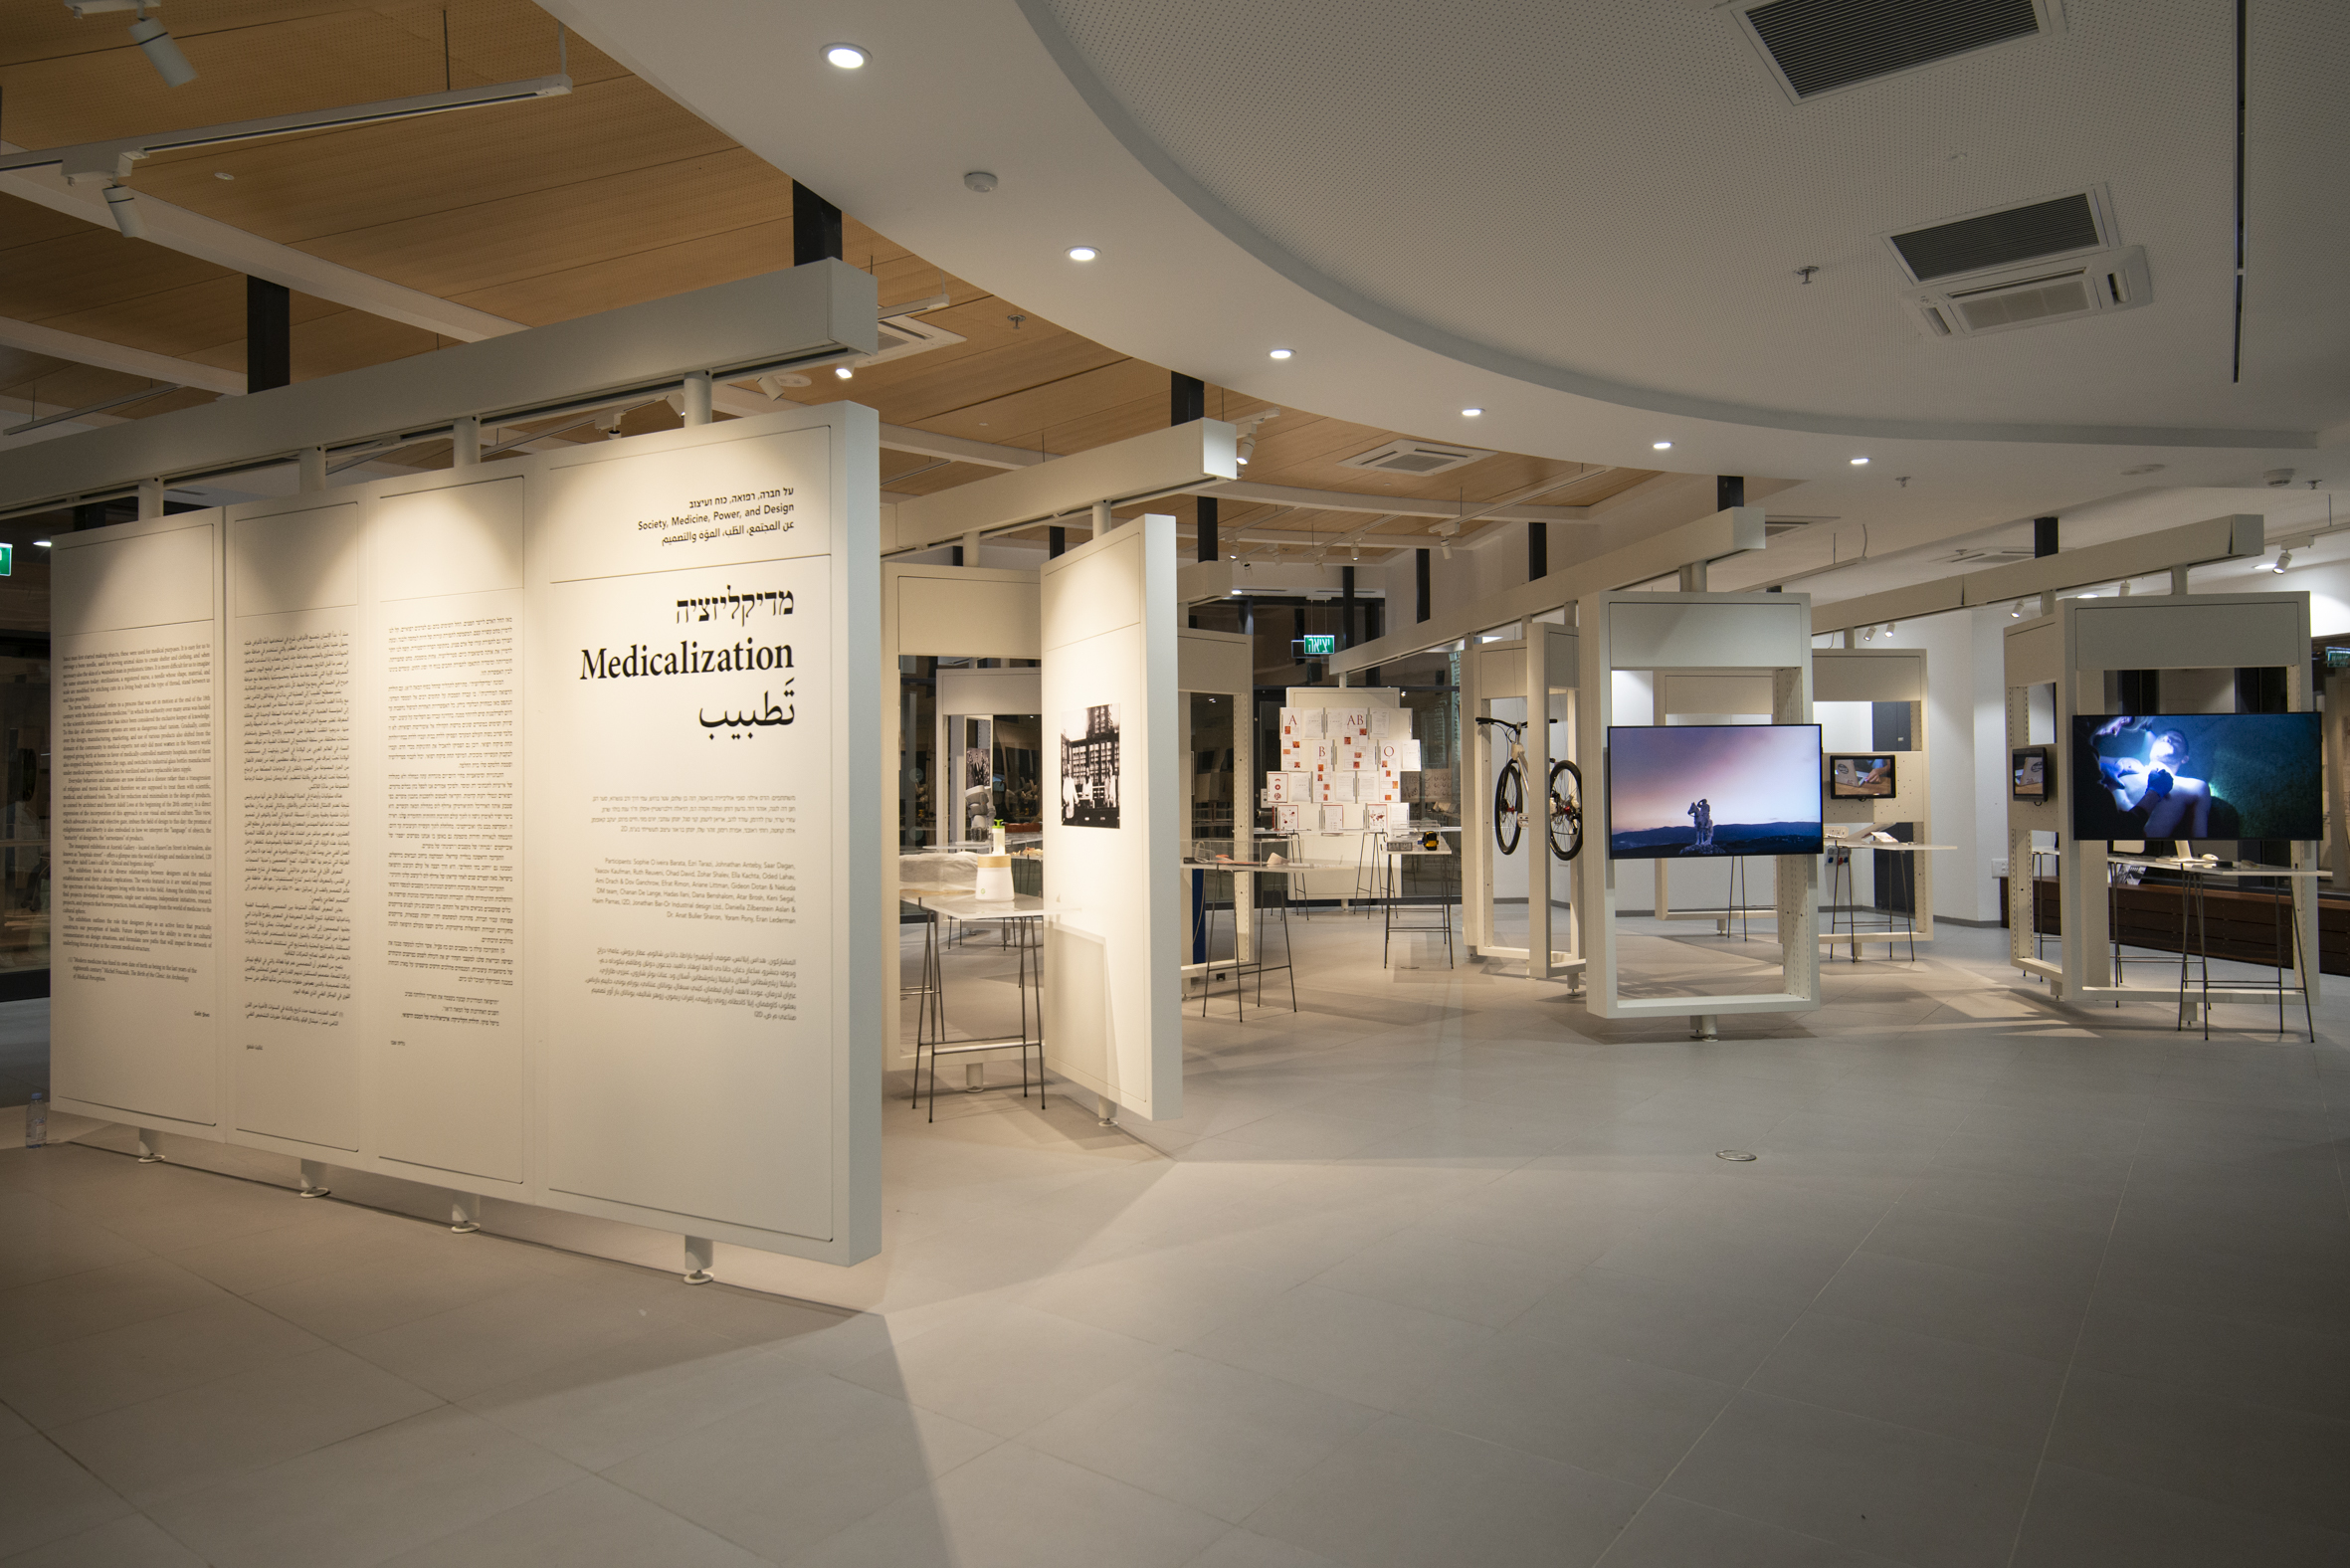 Medicalization exhibition